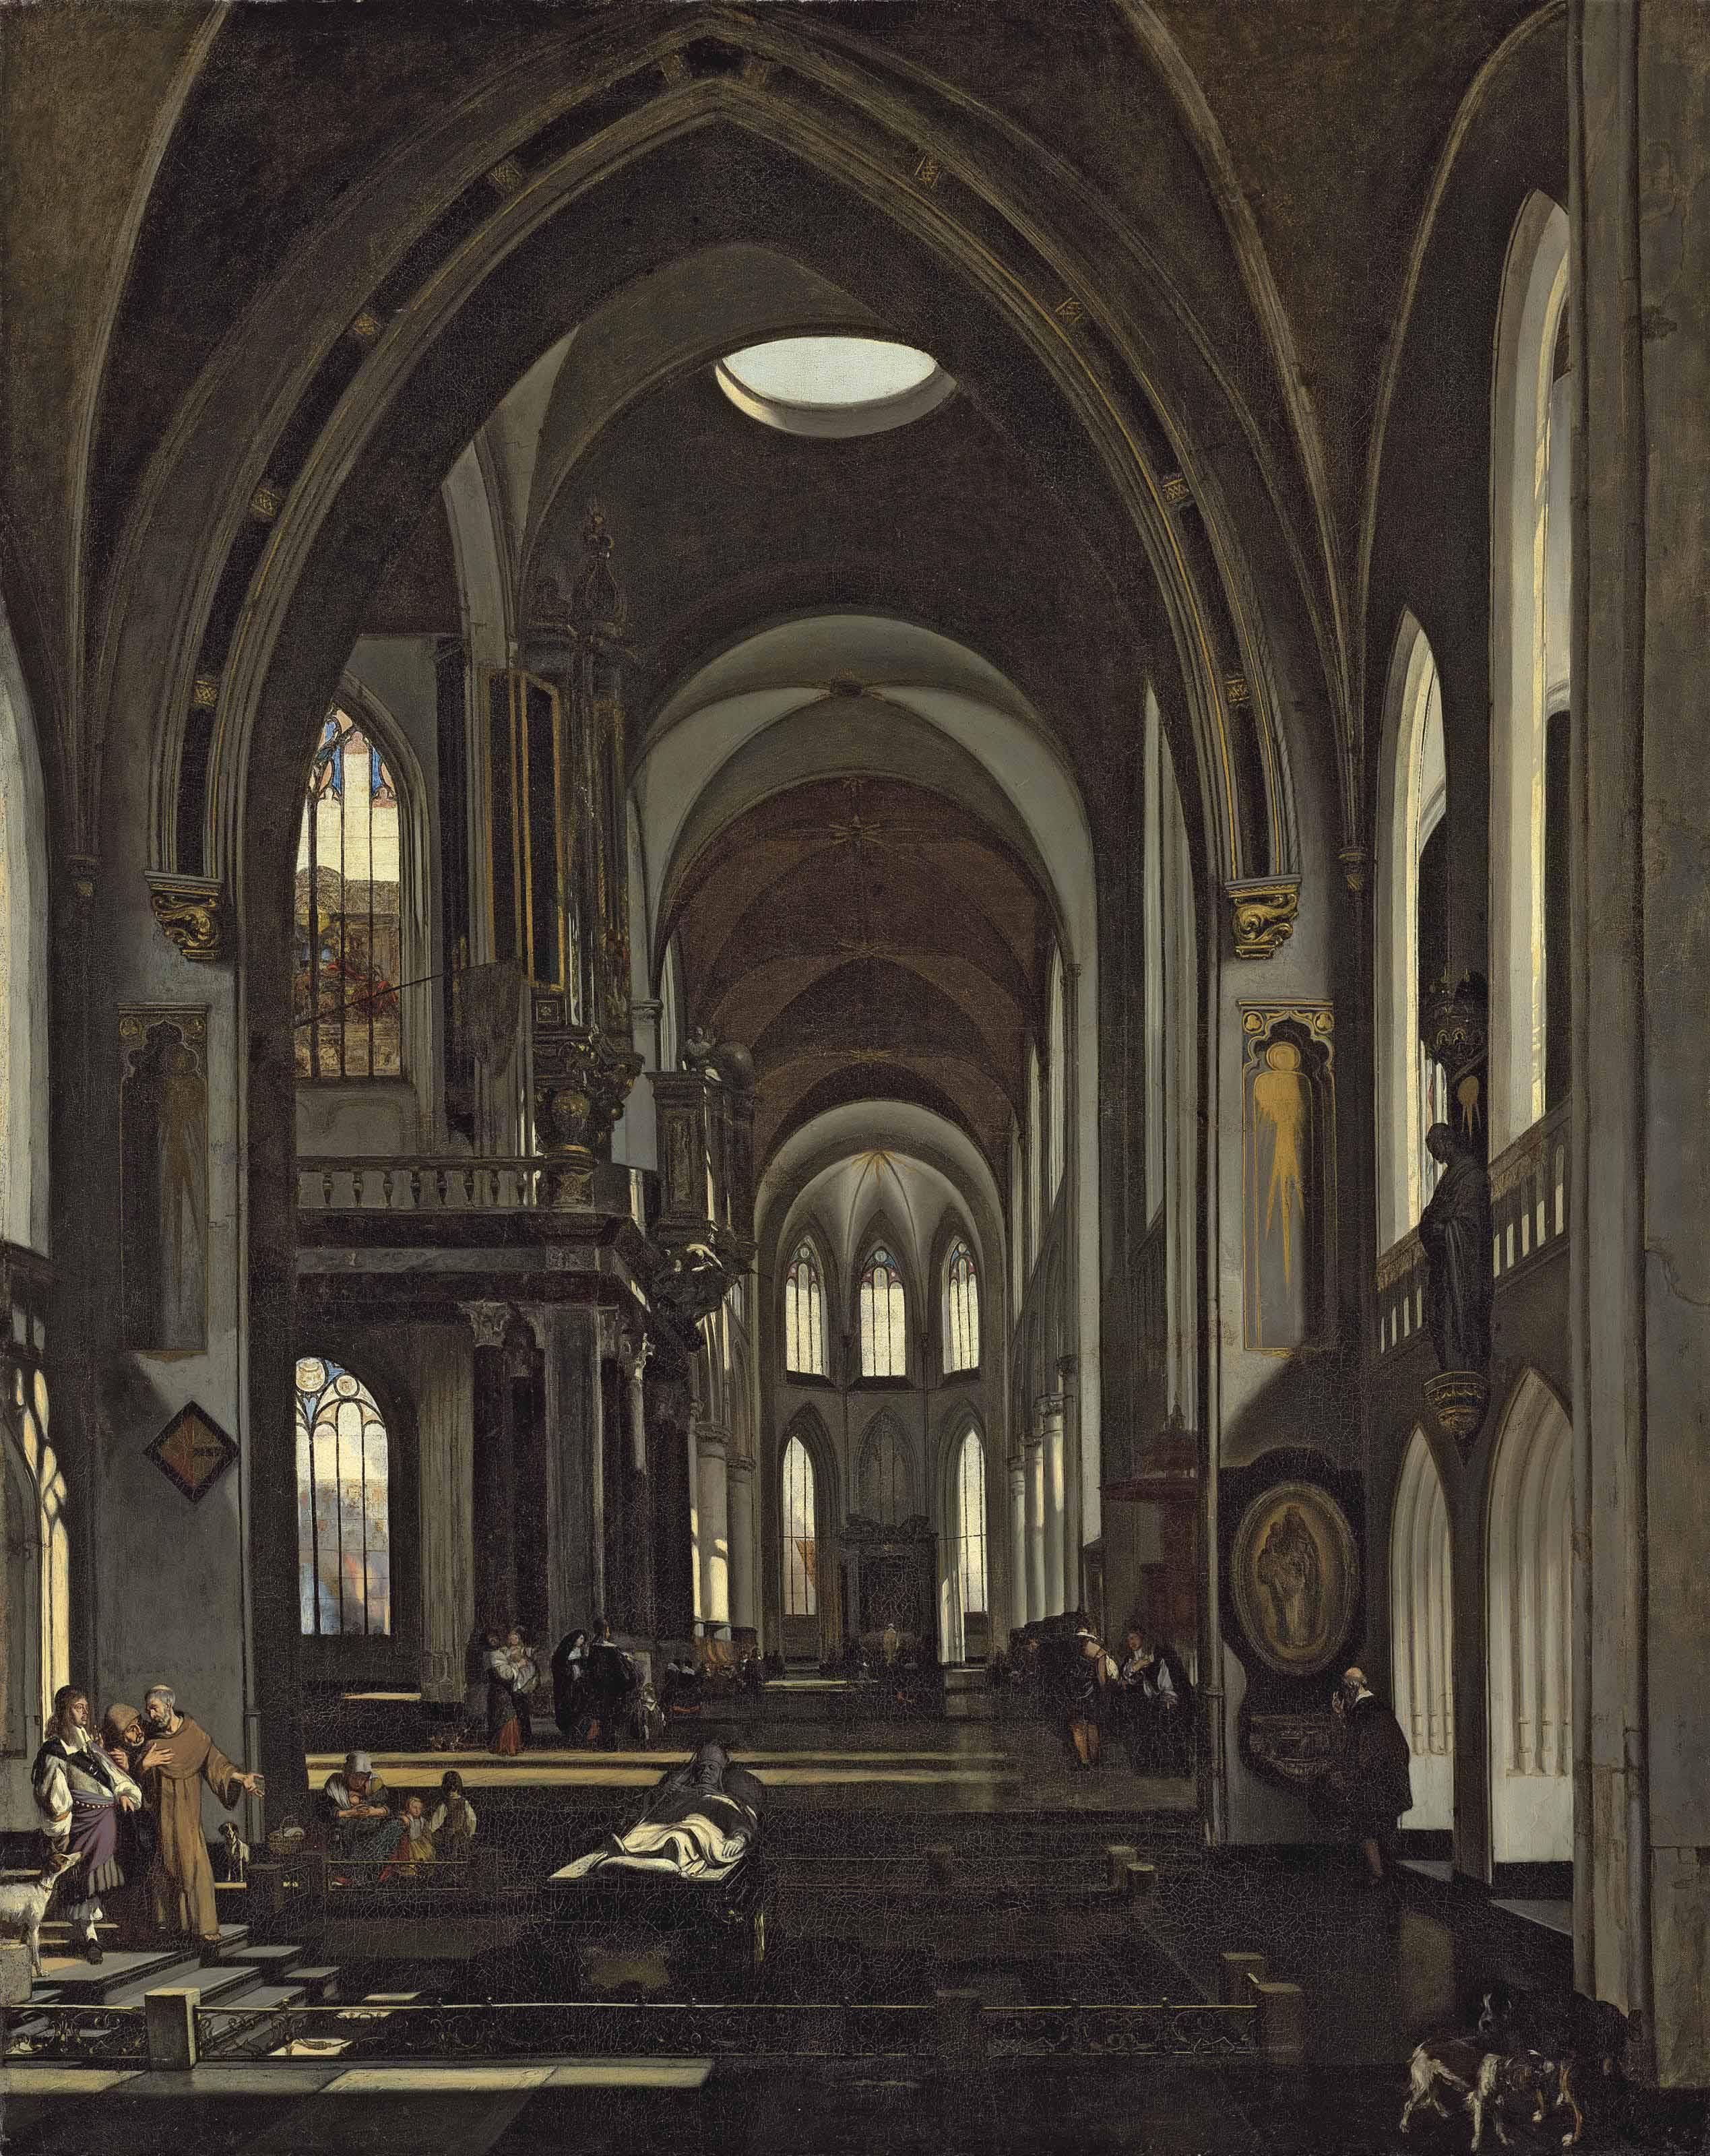 The interior of a catholic church